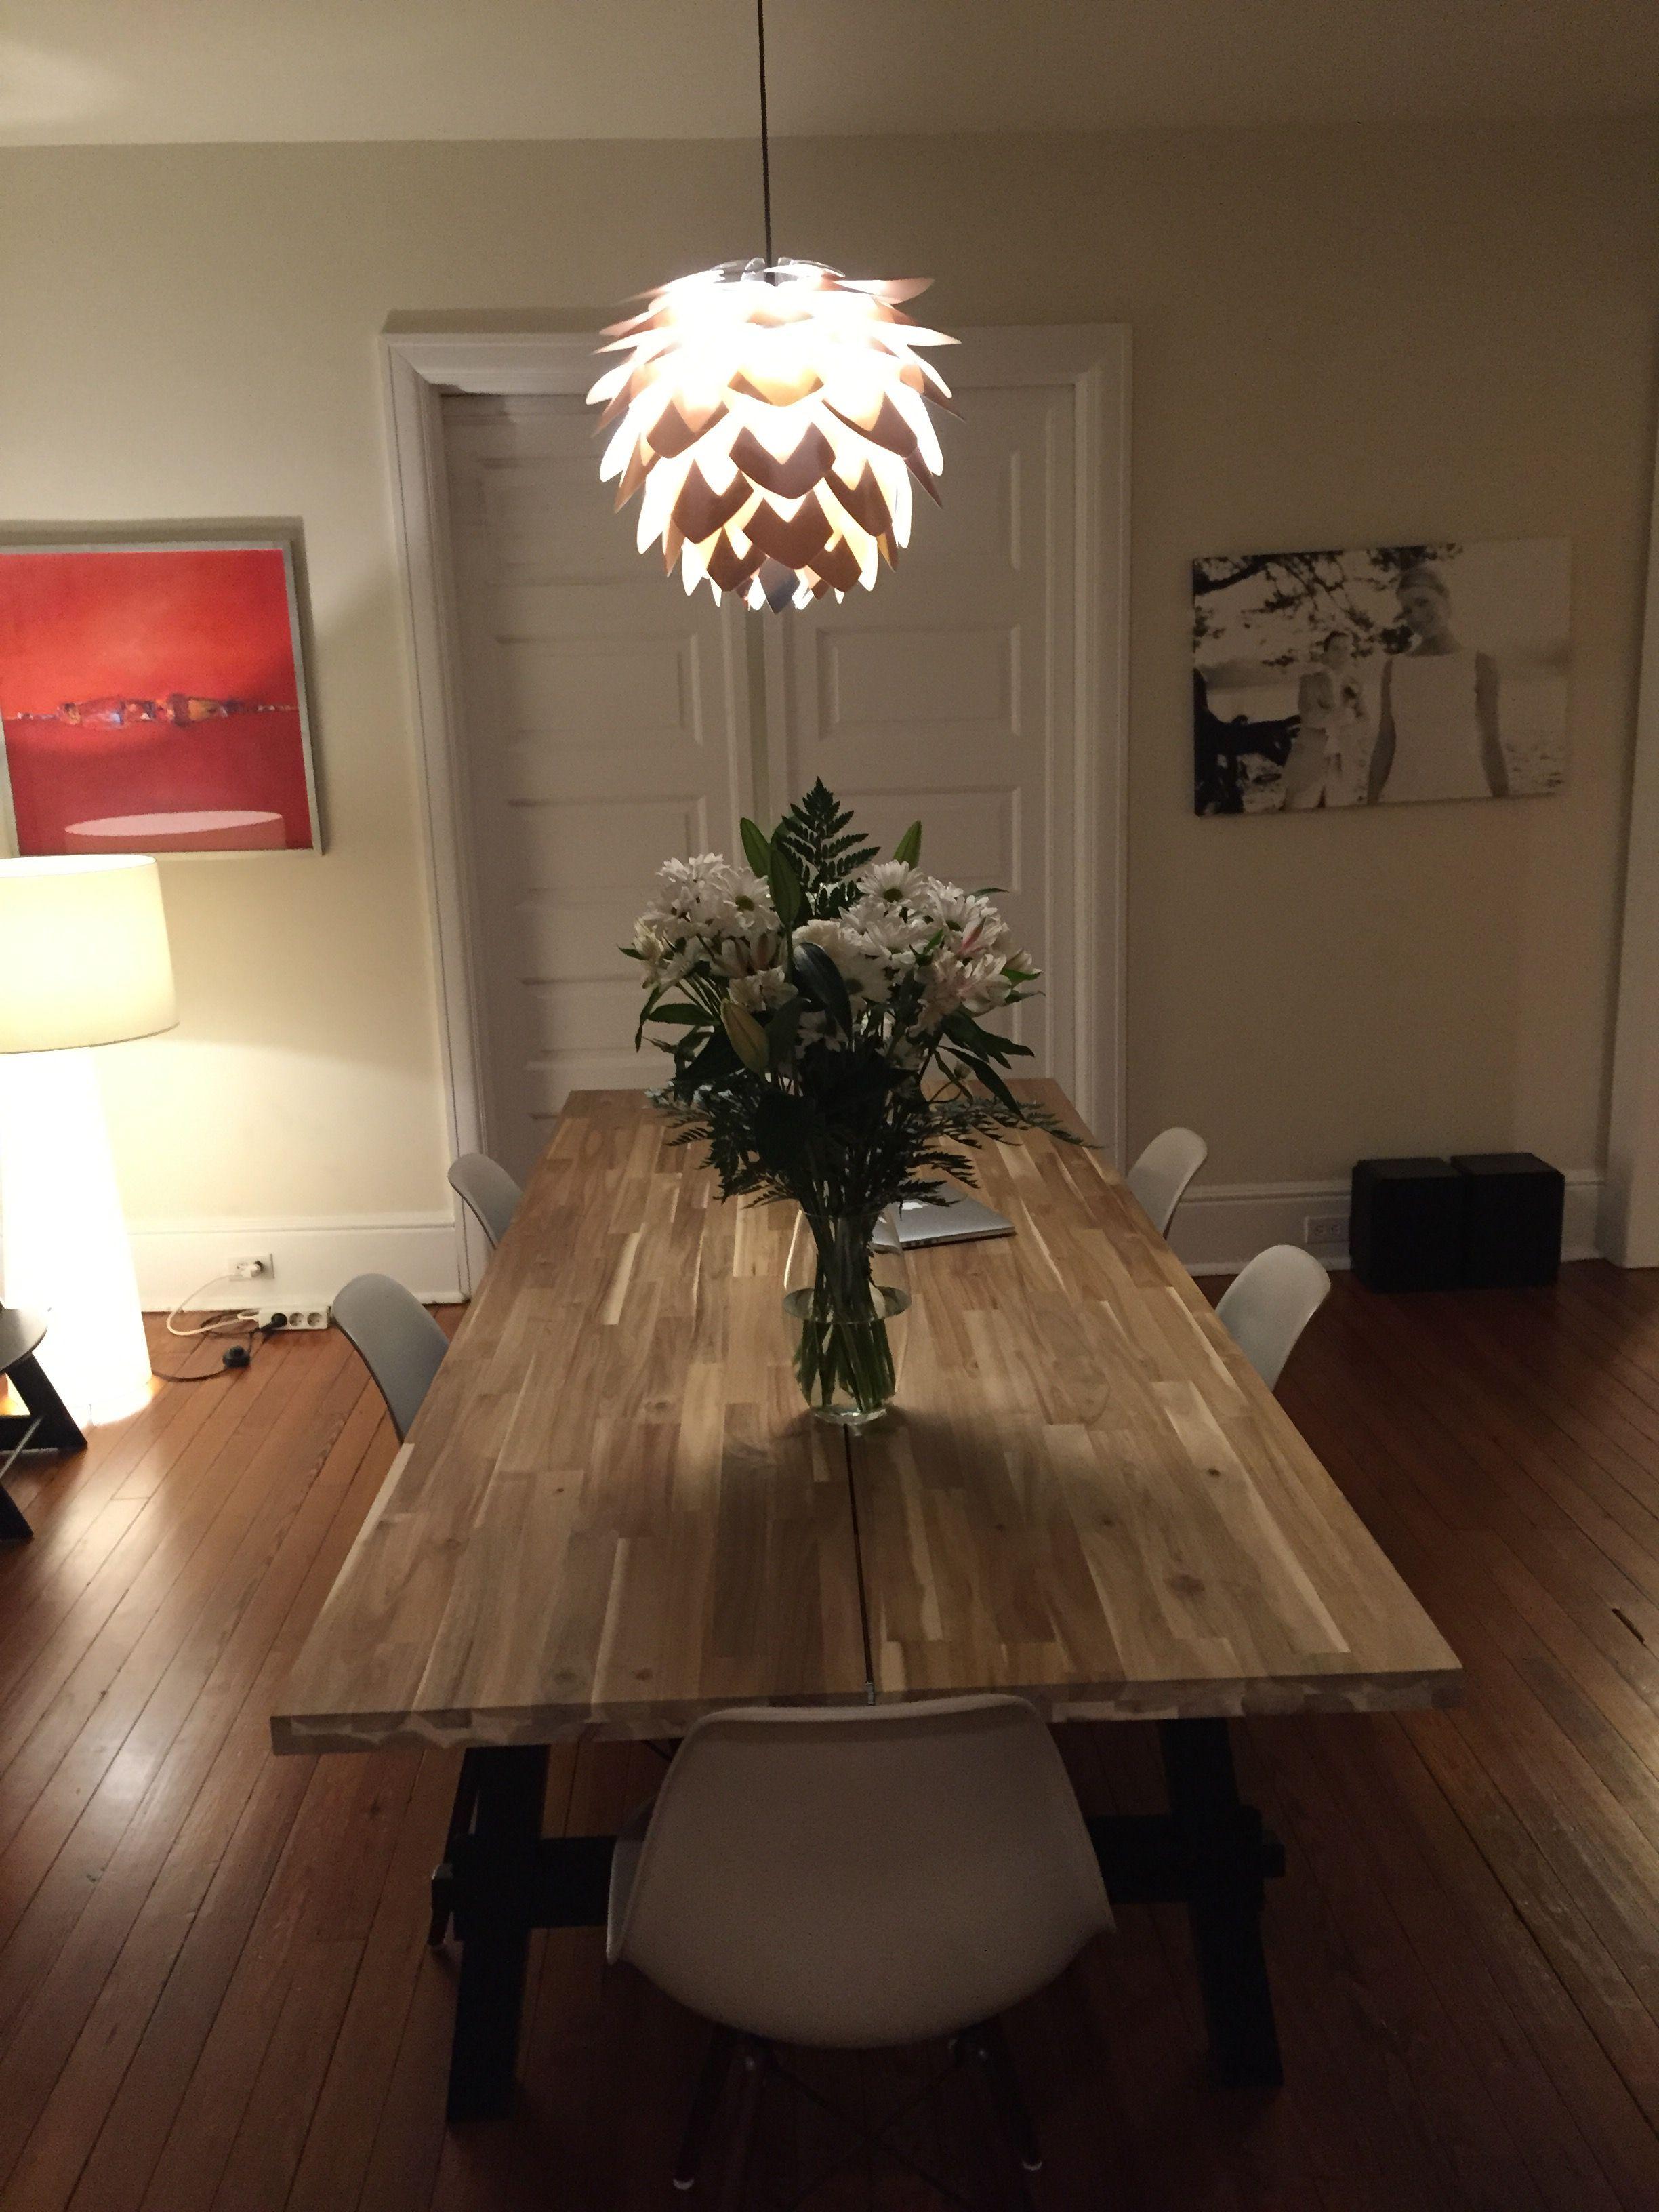 skogsta ikea table with beige eames reproductions interieur pinterest ikea table beige. Black Bedroom Furniture Sets. Home Design Ideas